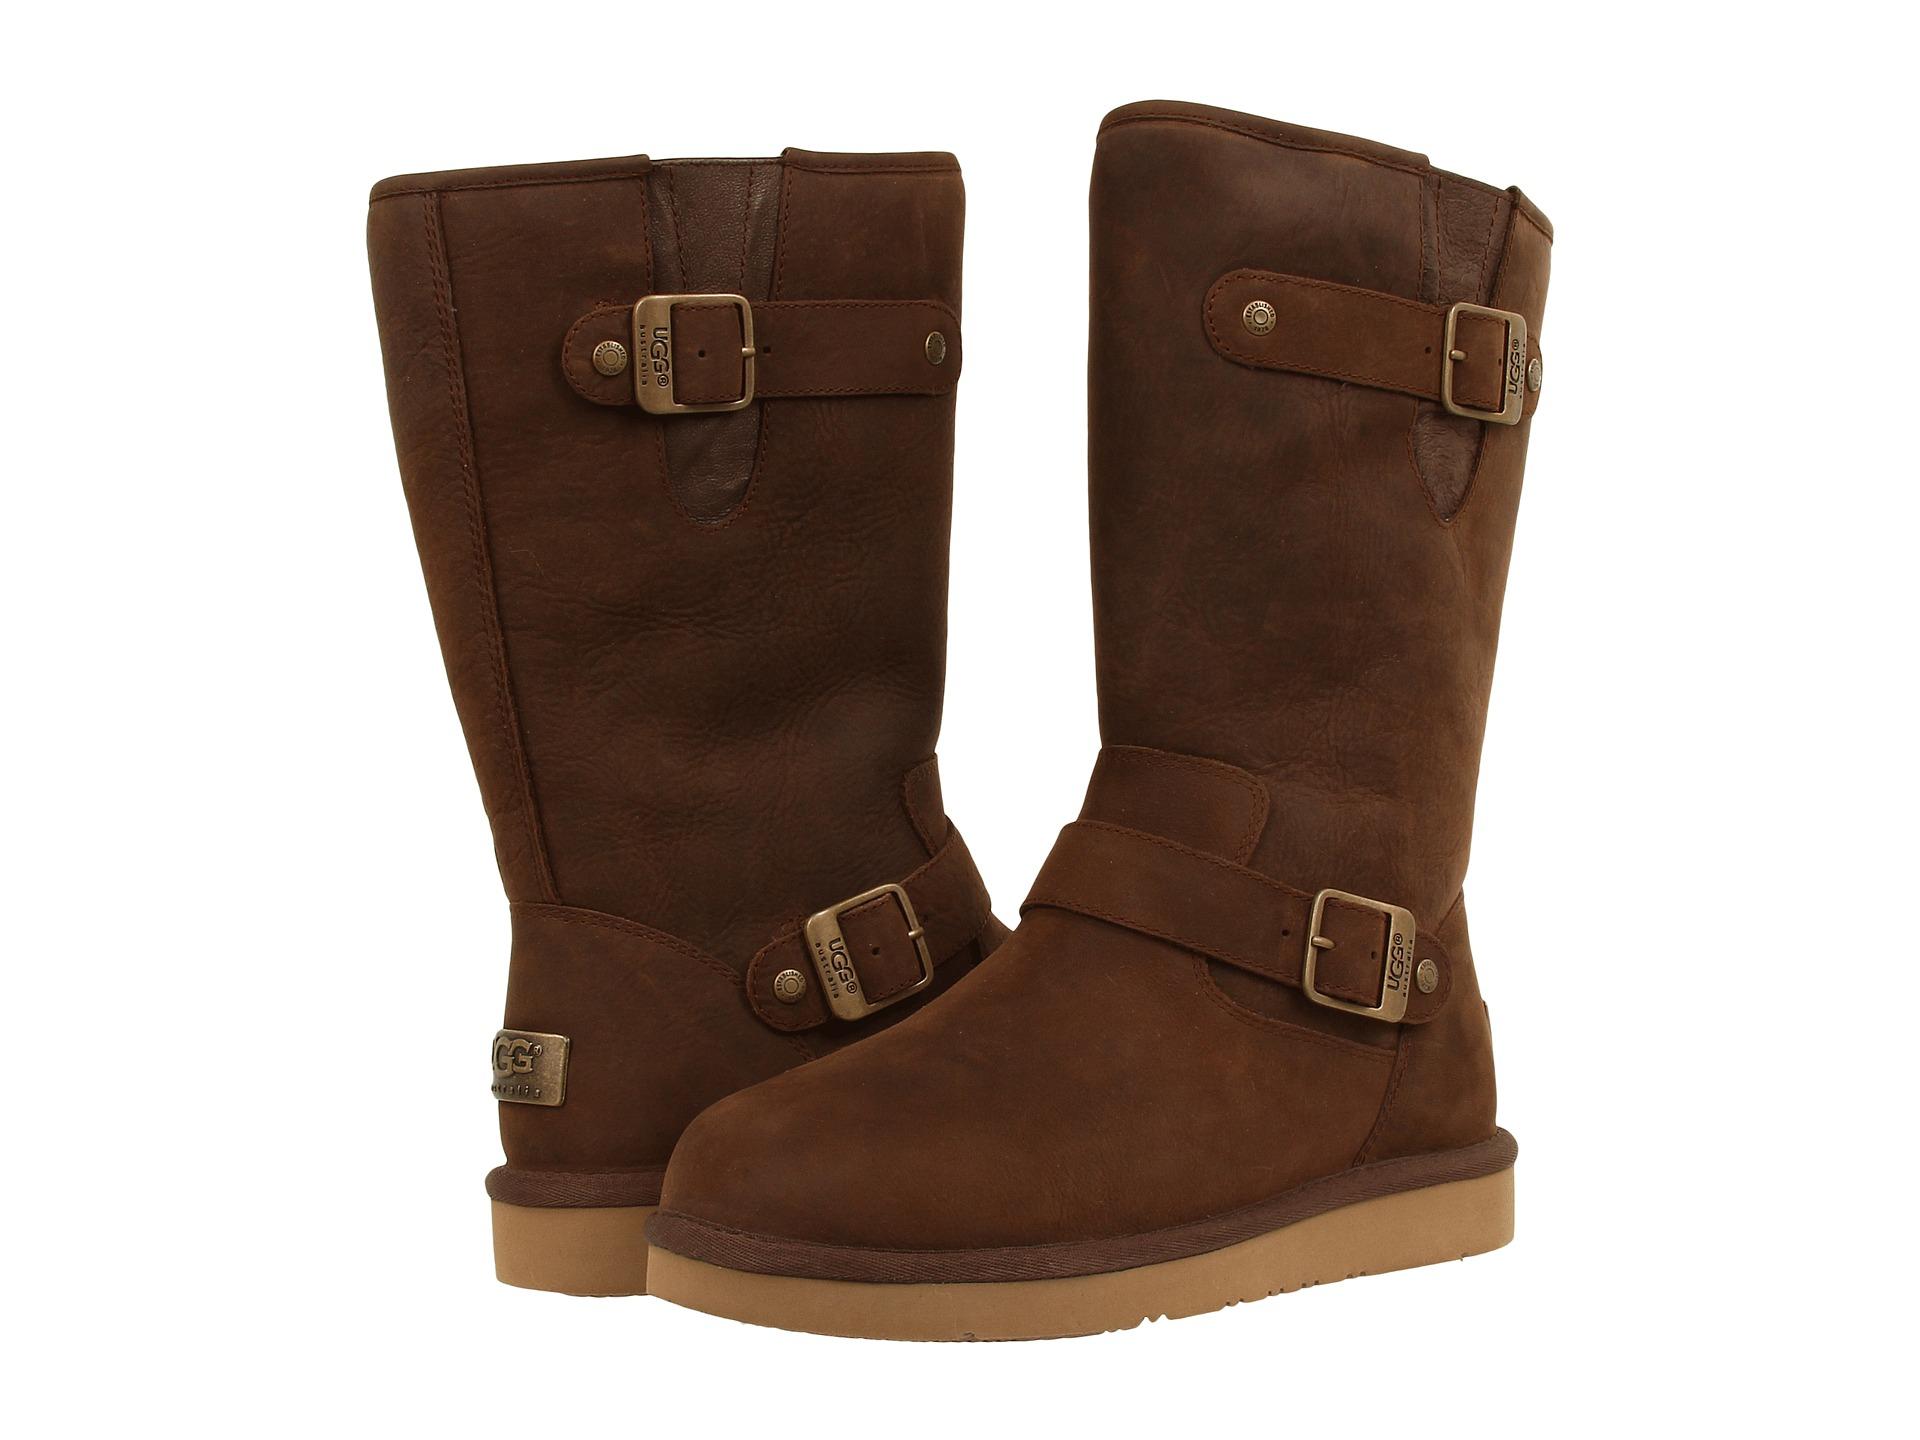 zappos ugg women boots sale italian sandals. Black Bedroom Furniture Sets. Home Design Ideas